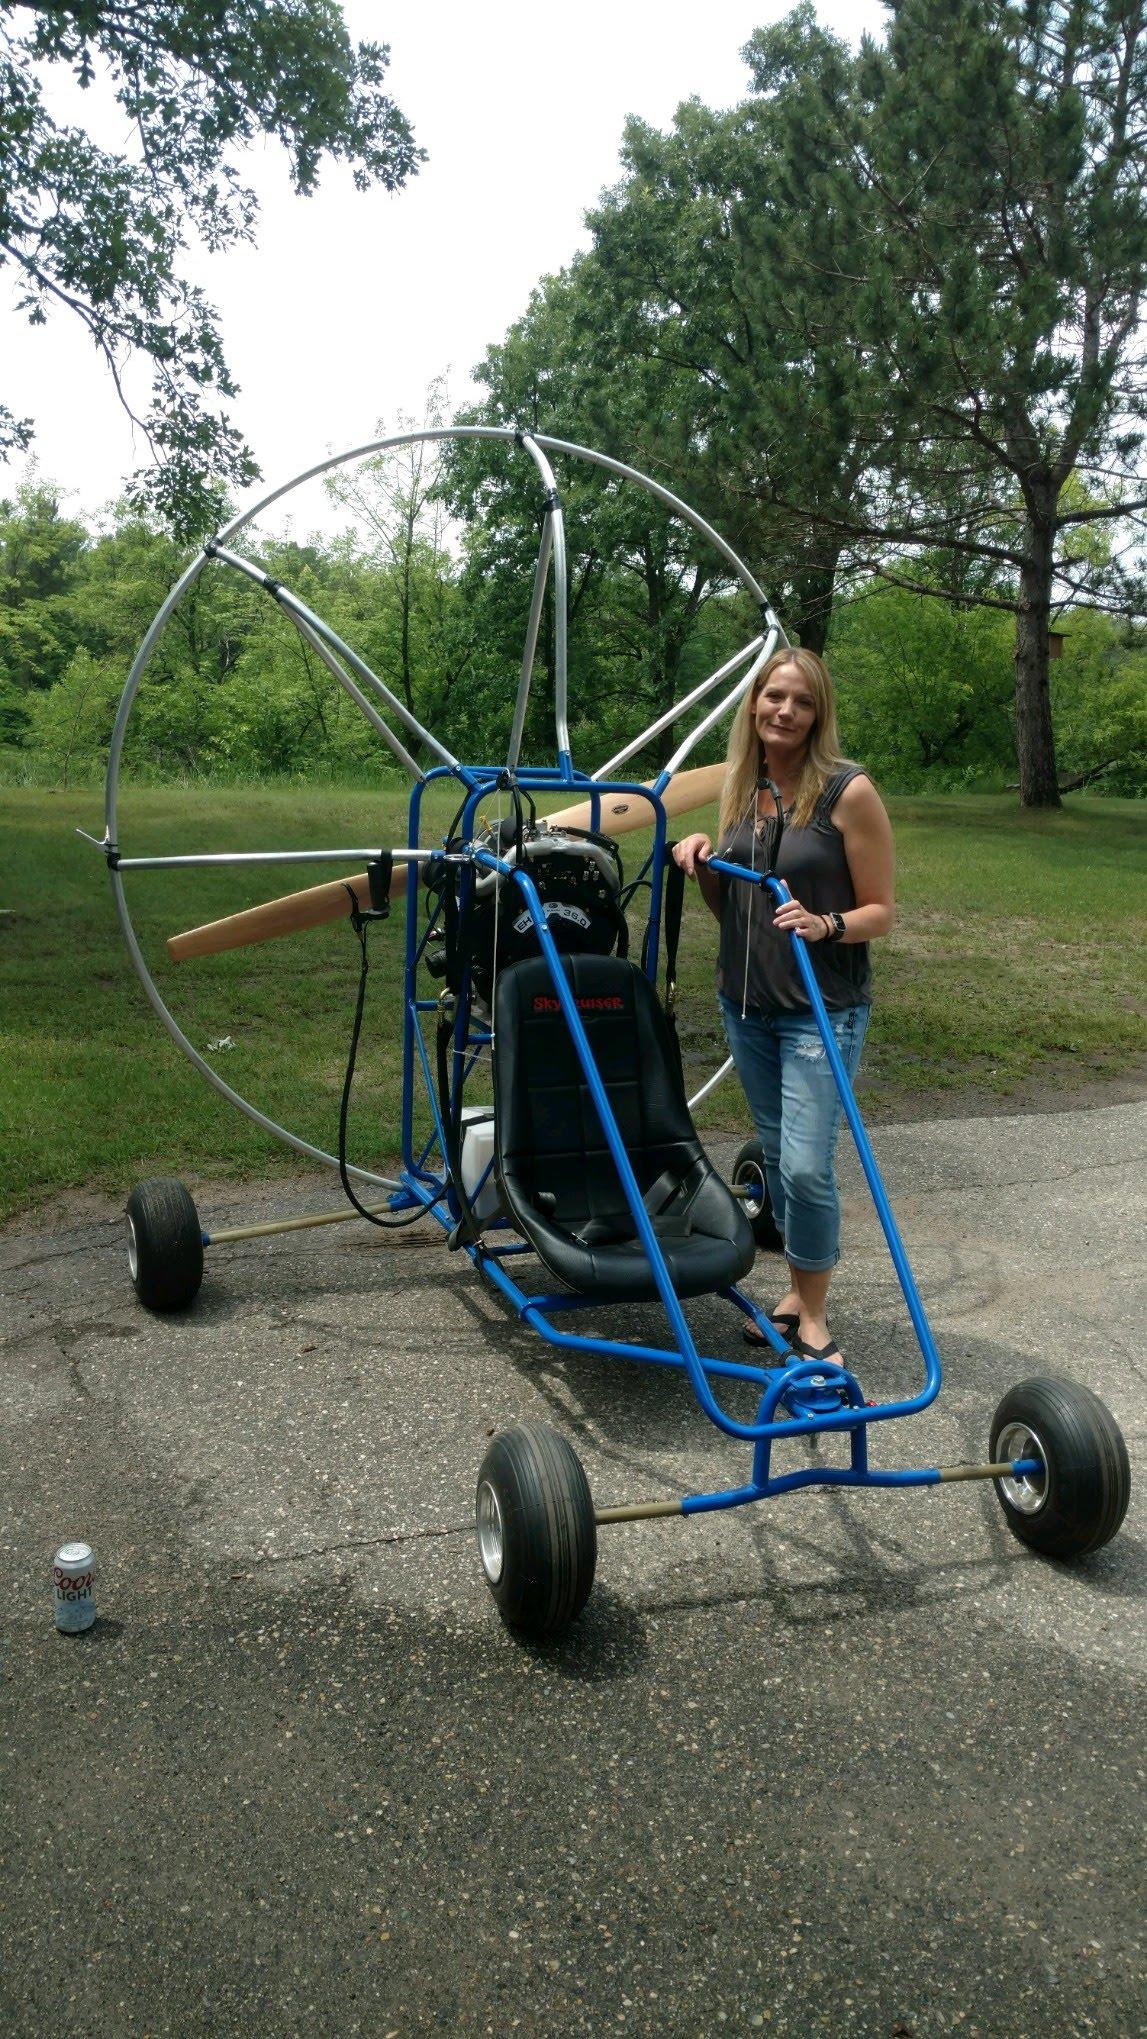 Skycruiser 4-stroke Powered Paraglider